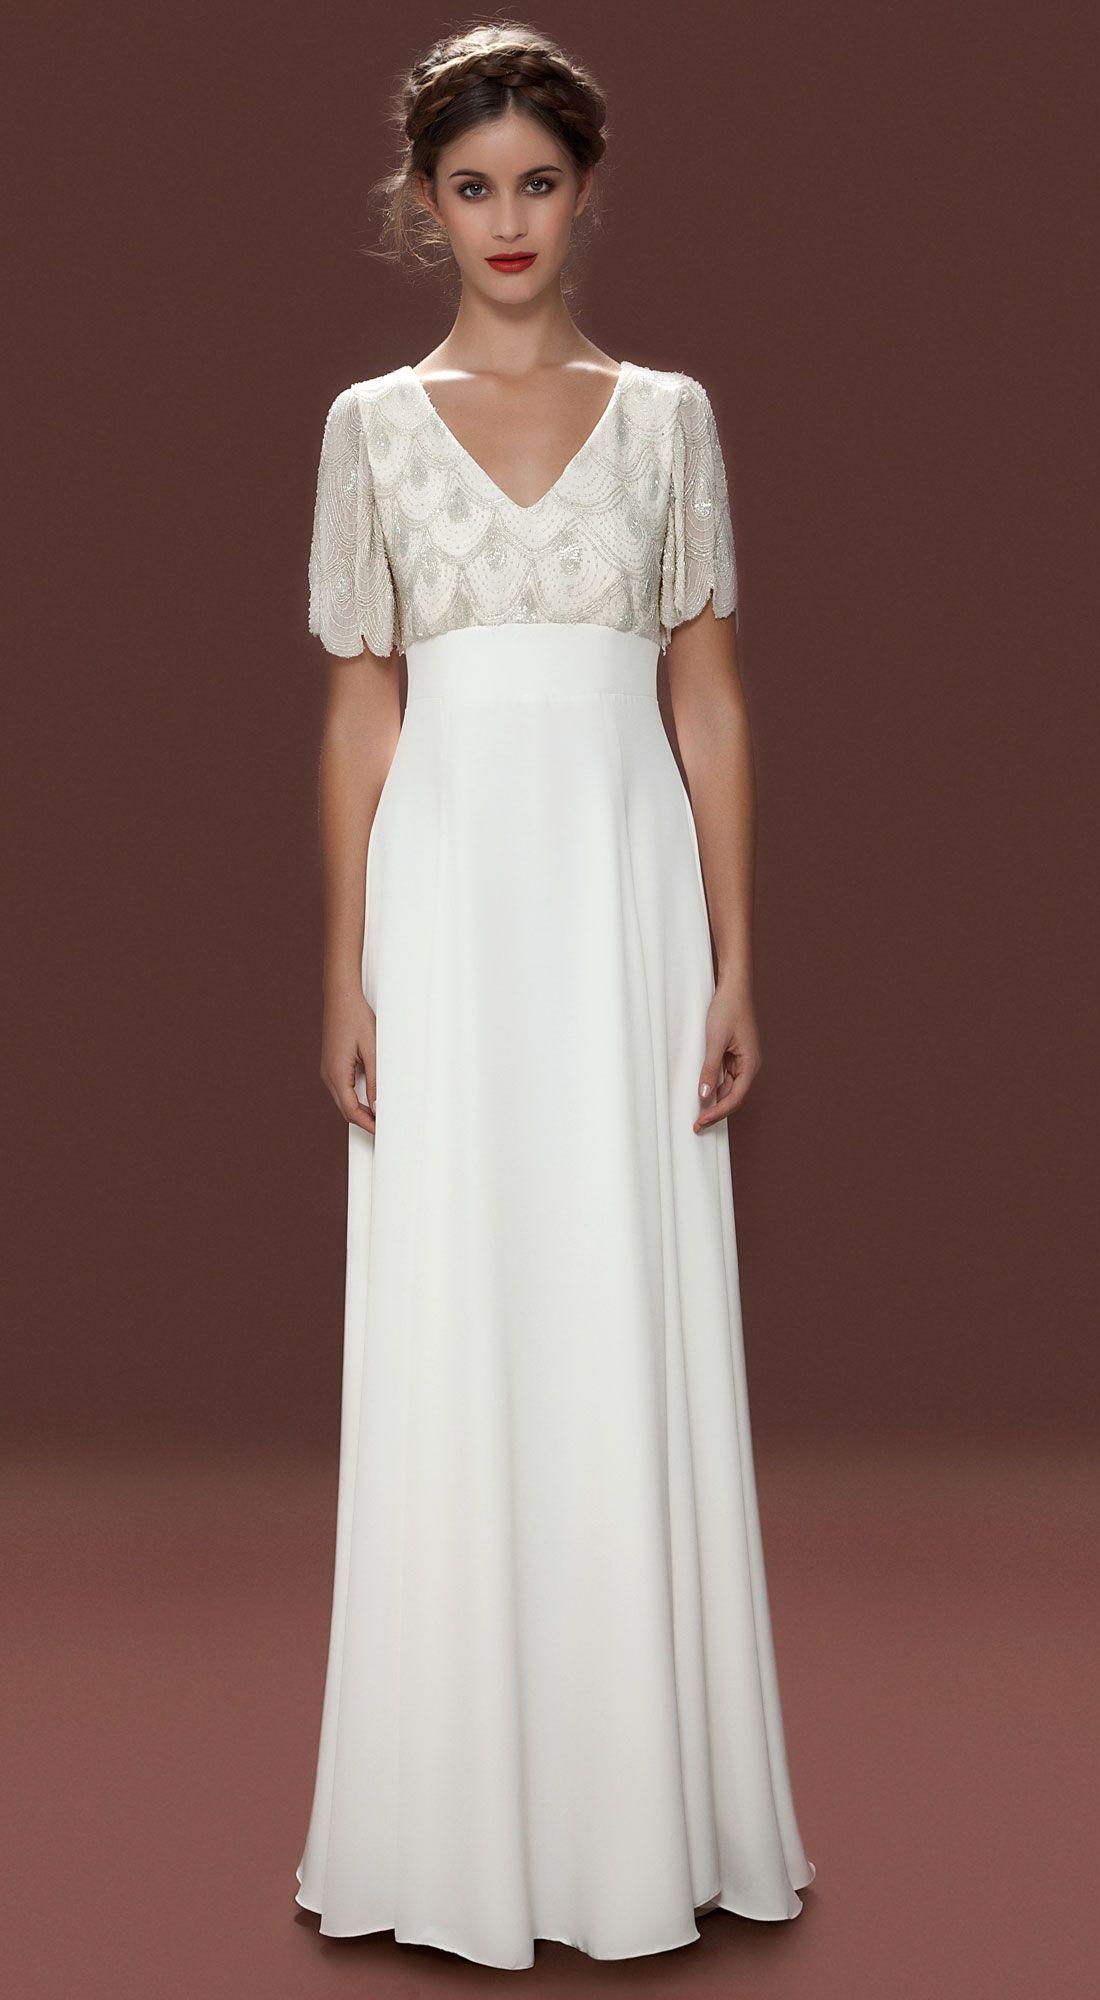 Vintage Style Wedding Dresses Beaded Wedding Dresses Lara Hannah